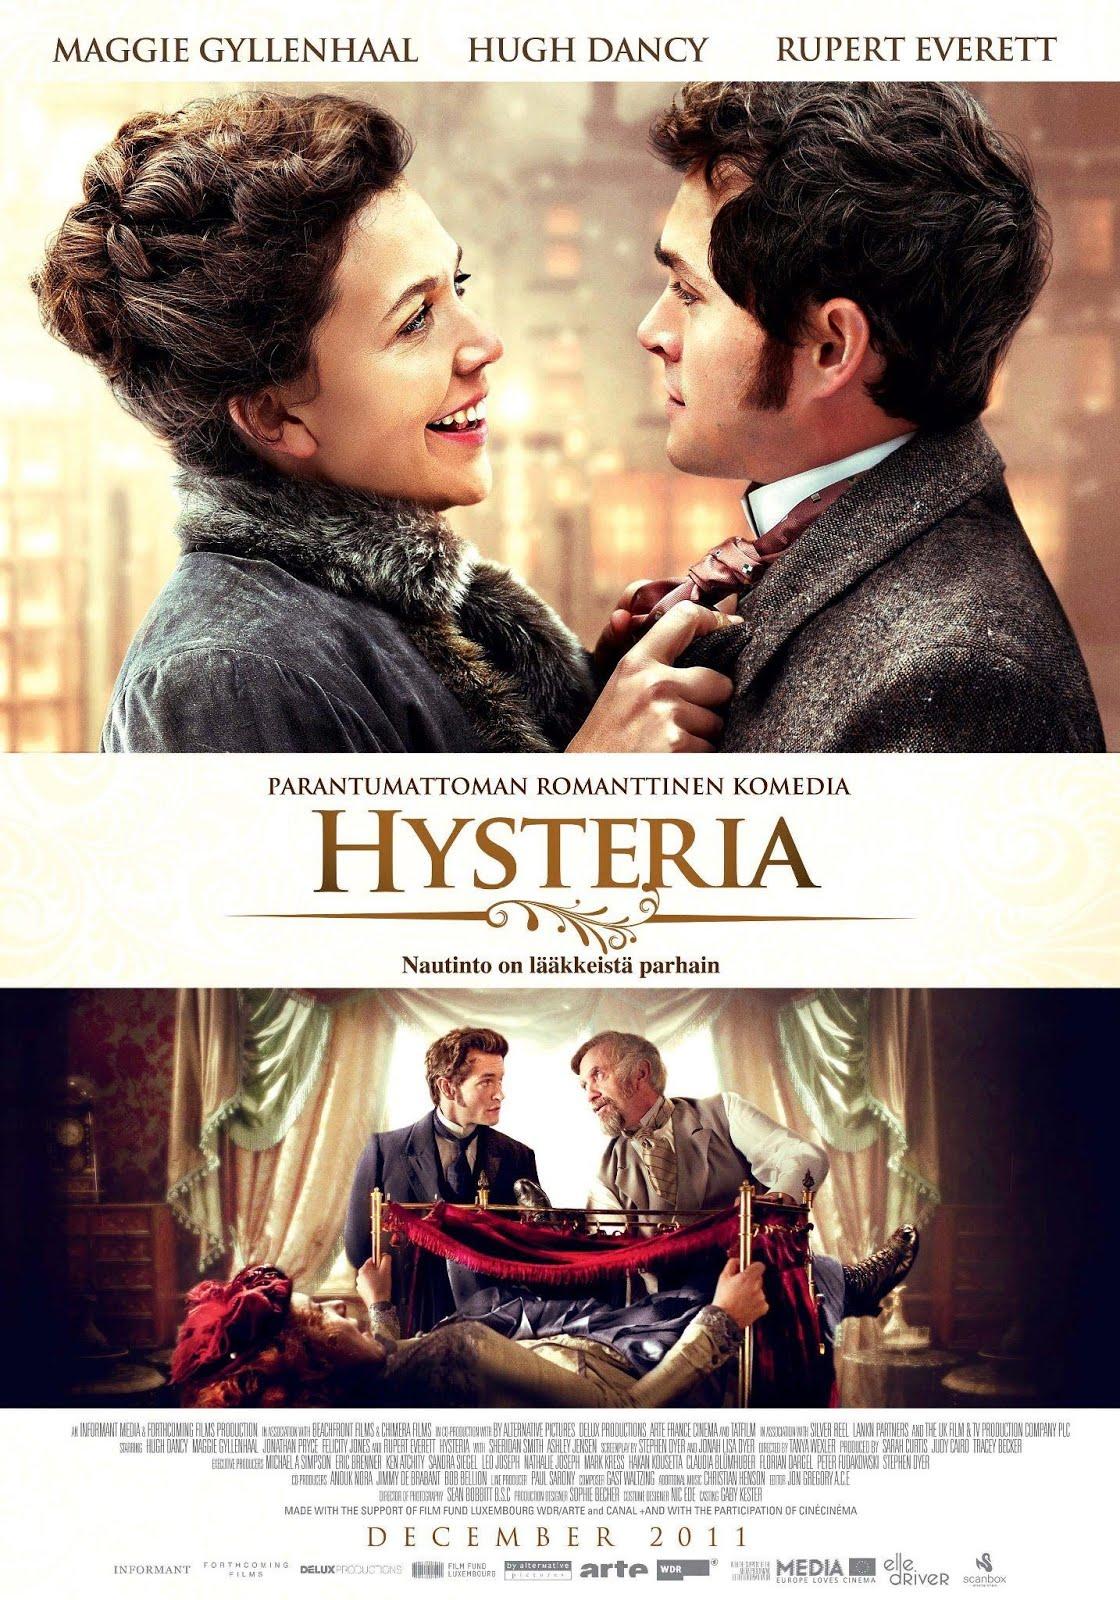 http://1.bp.blogspot.com/-SGIl-Eh64LU/UQYdOFBA63I/AAAAAAAAFAI/opRJKlg0IJA/s1600/hysteria.jpg